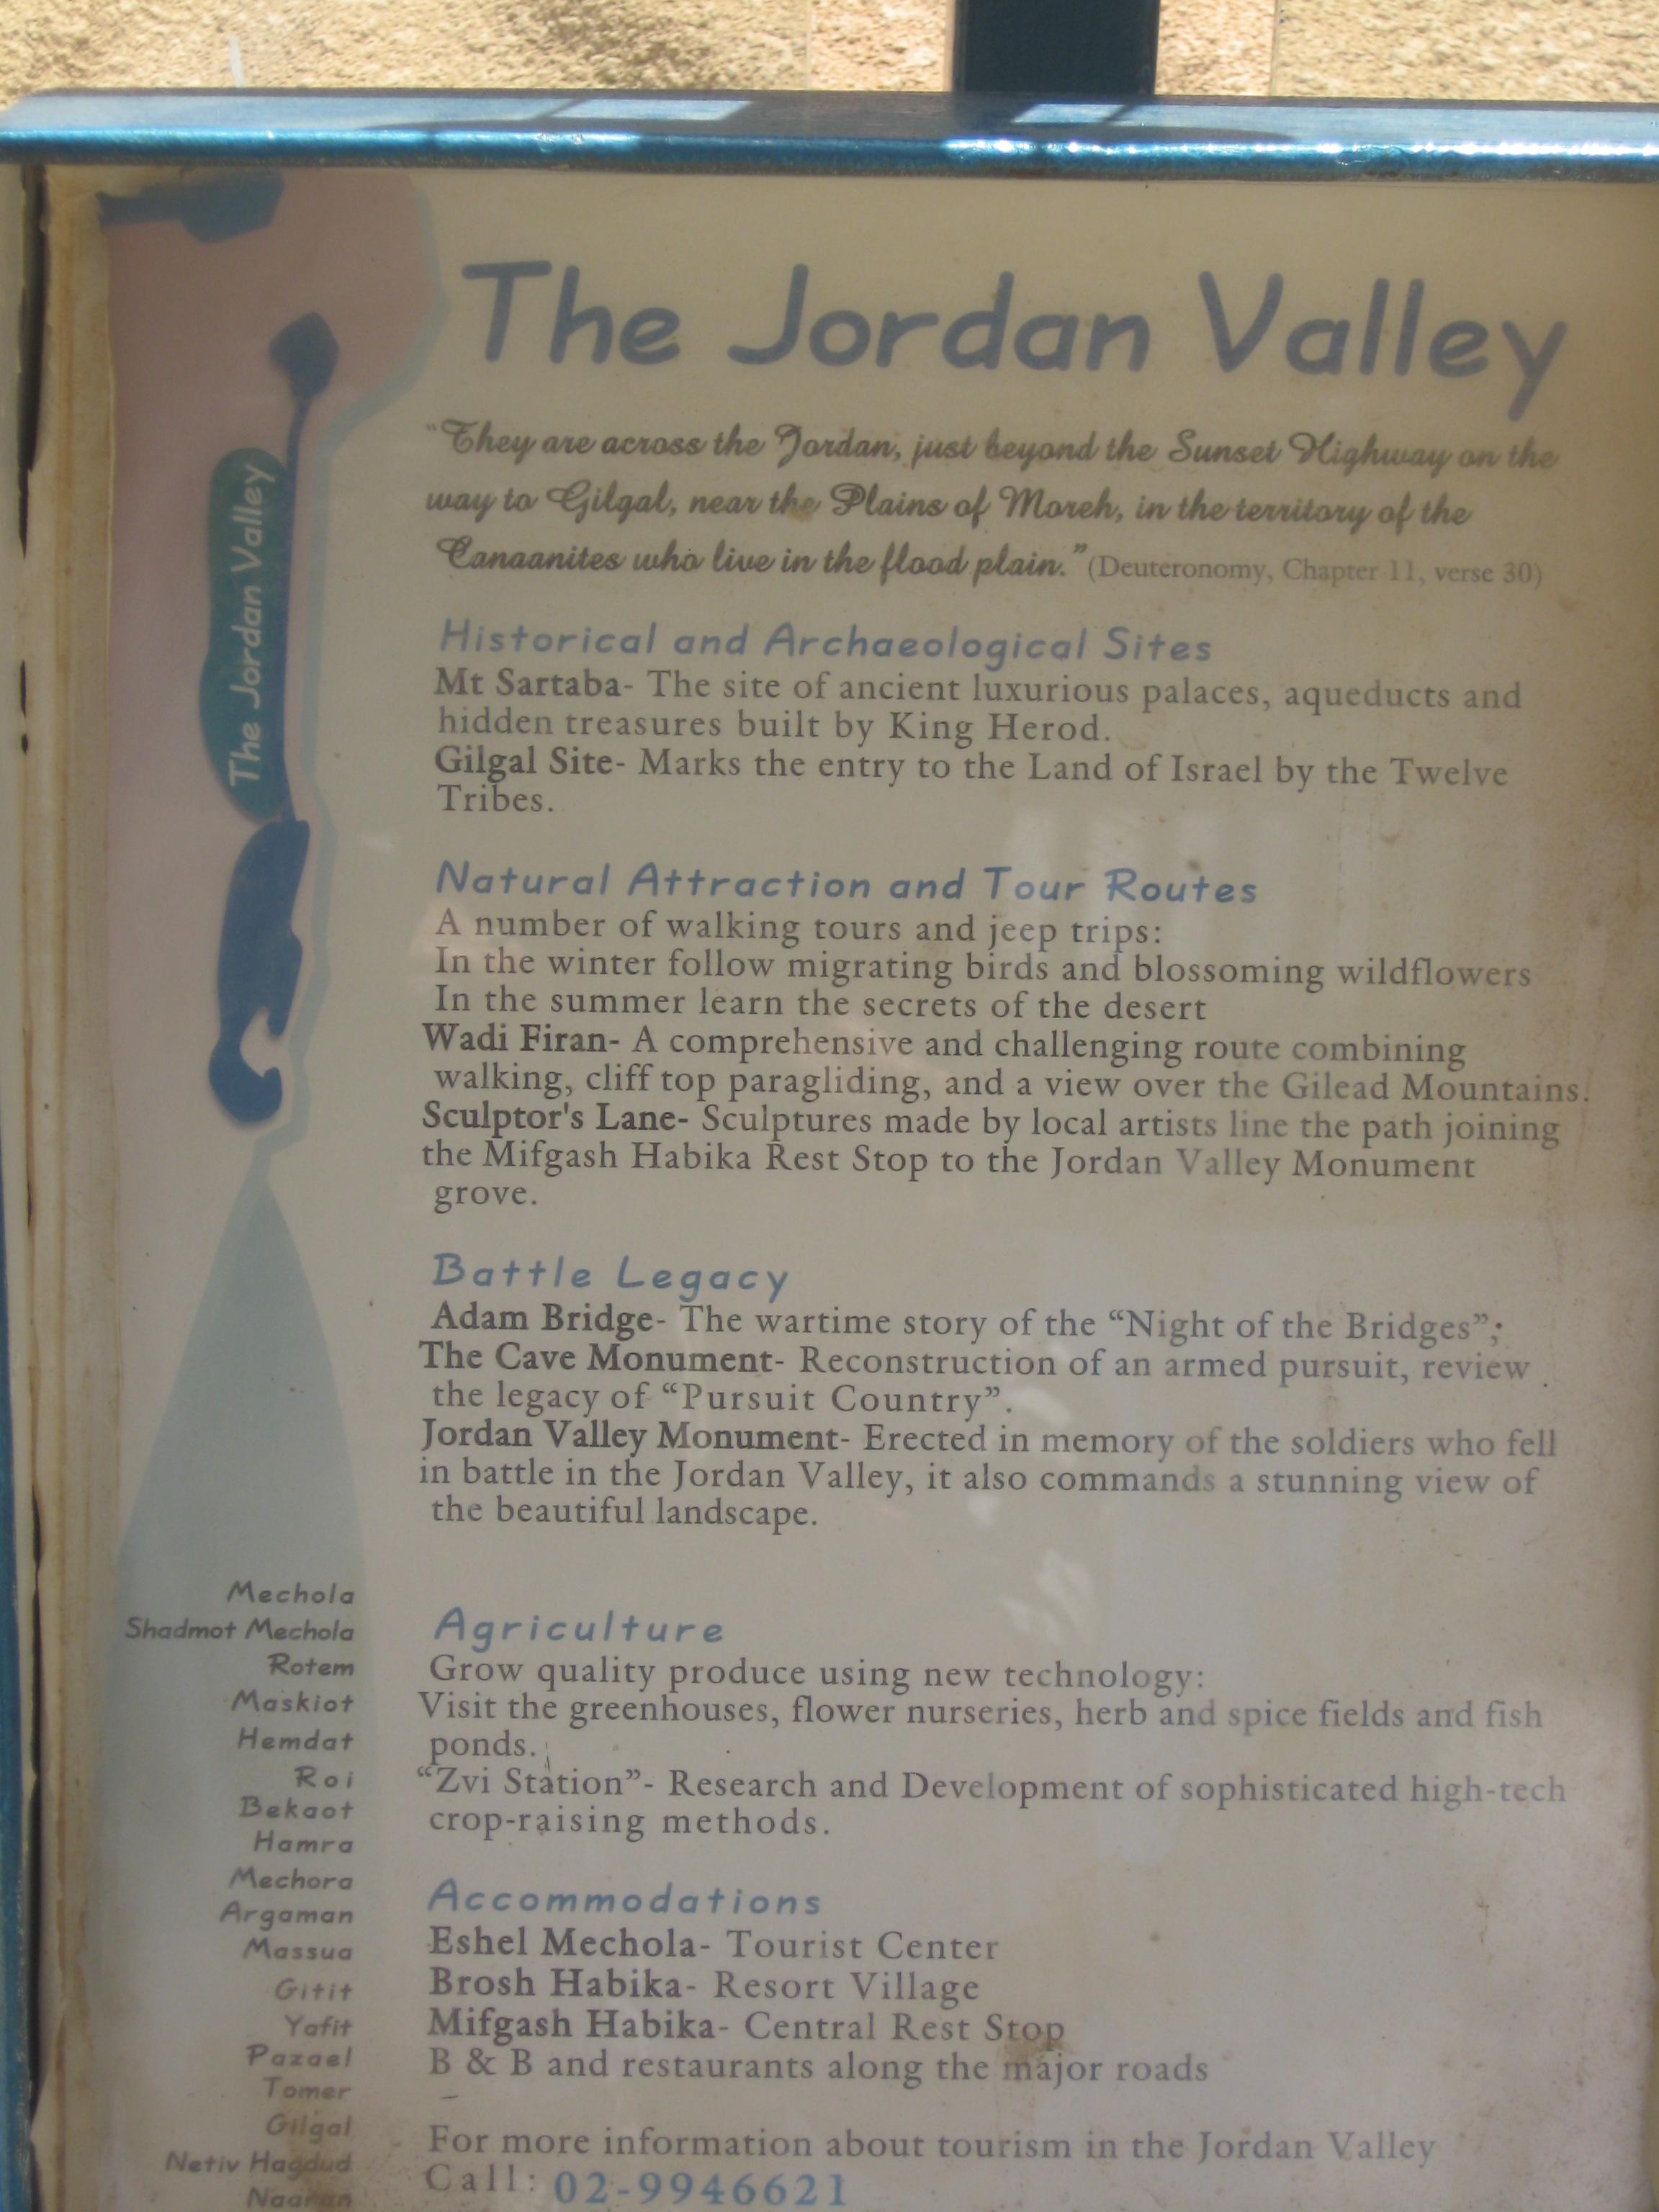 jordan valley jewish singles Ayelet tours, ltd search all tours (jewish singles) cuba all tours the jordan valley, the dead sea, mt nebo, the shobak (crusaders castle.